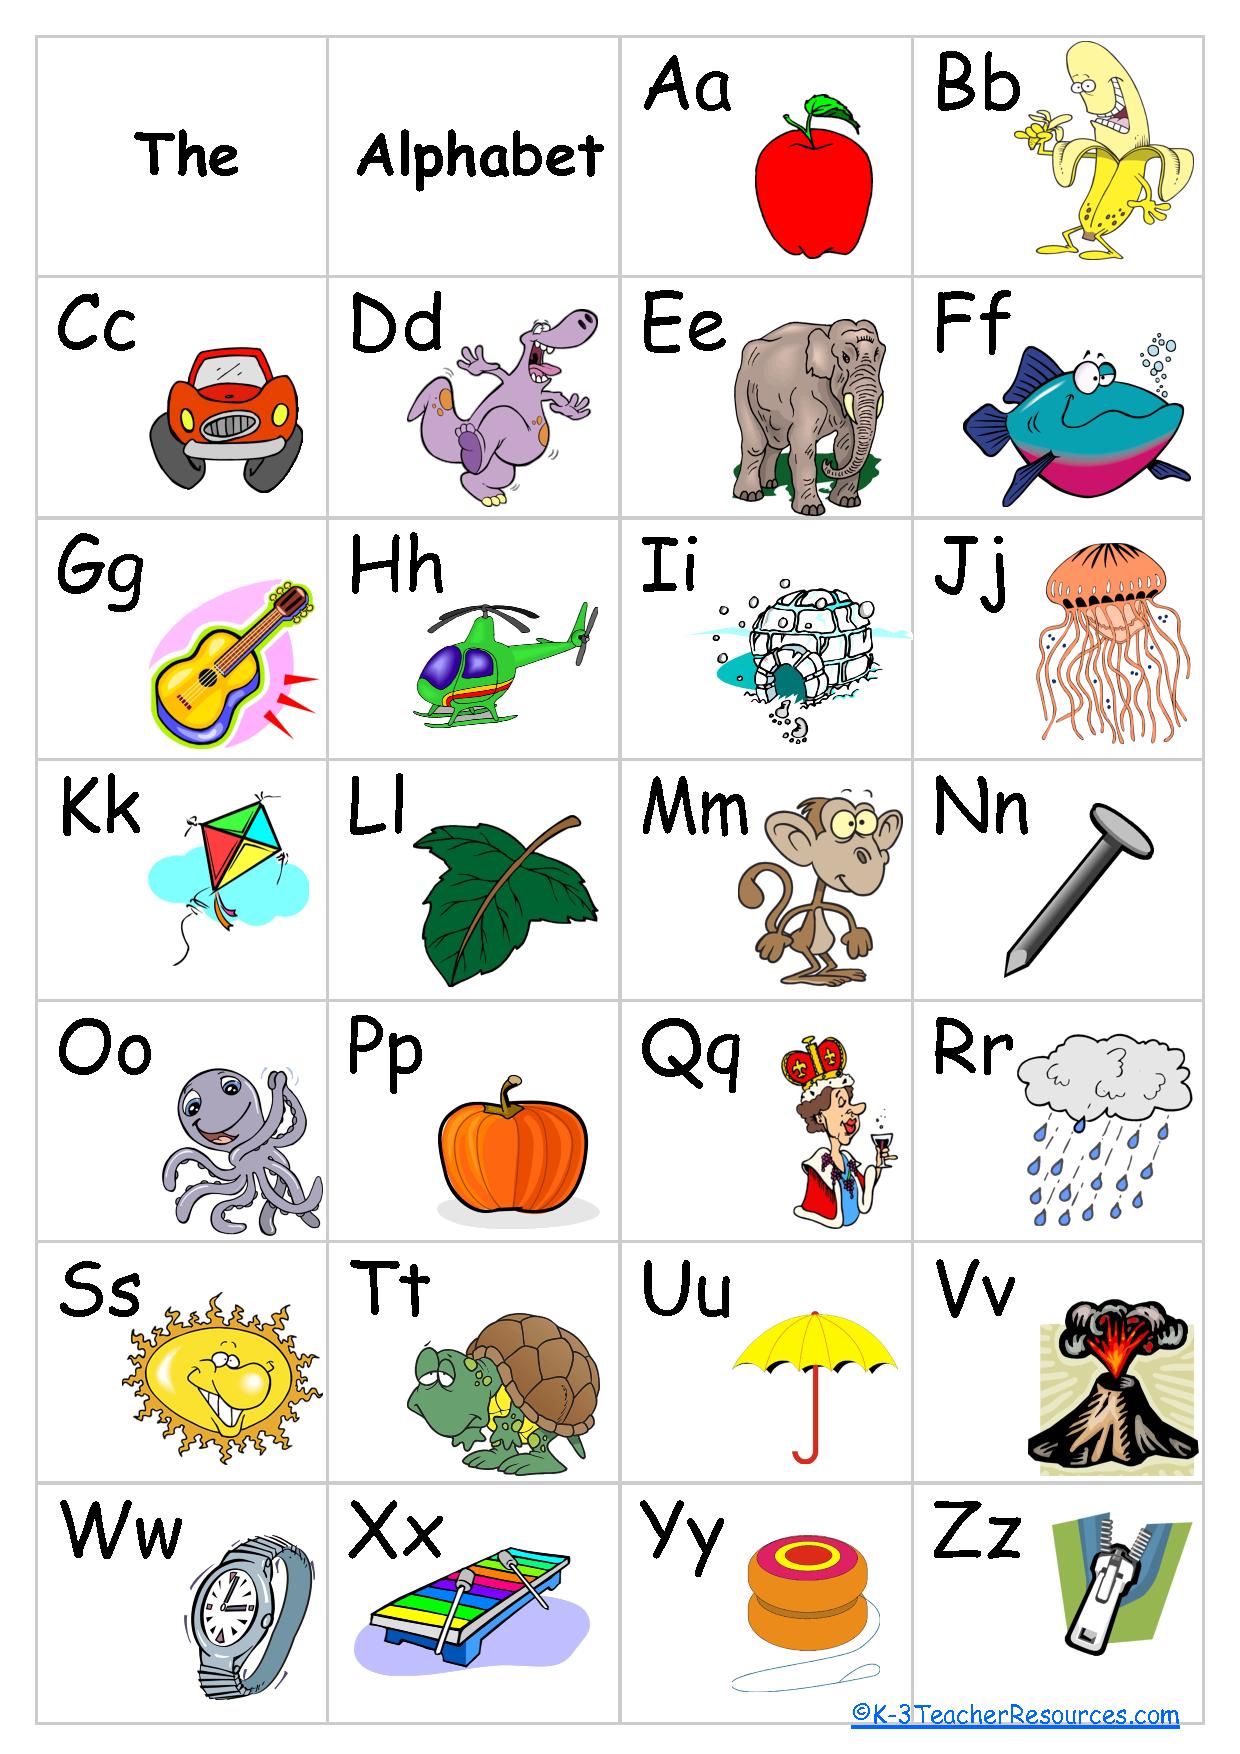 Free+Printable+Alphabet+Chart | Schoolroom Ideas | Pinterest - Free Printable Alphabet Chart